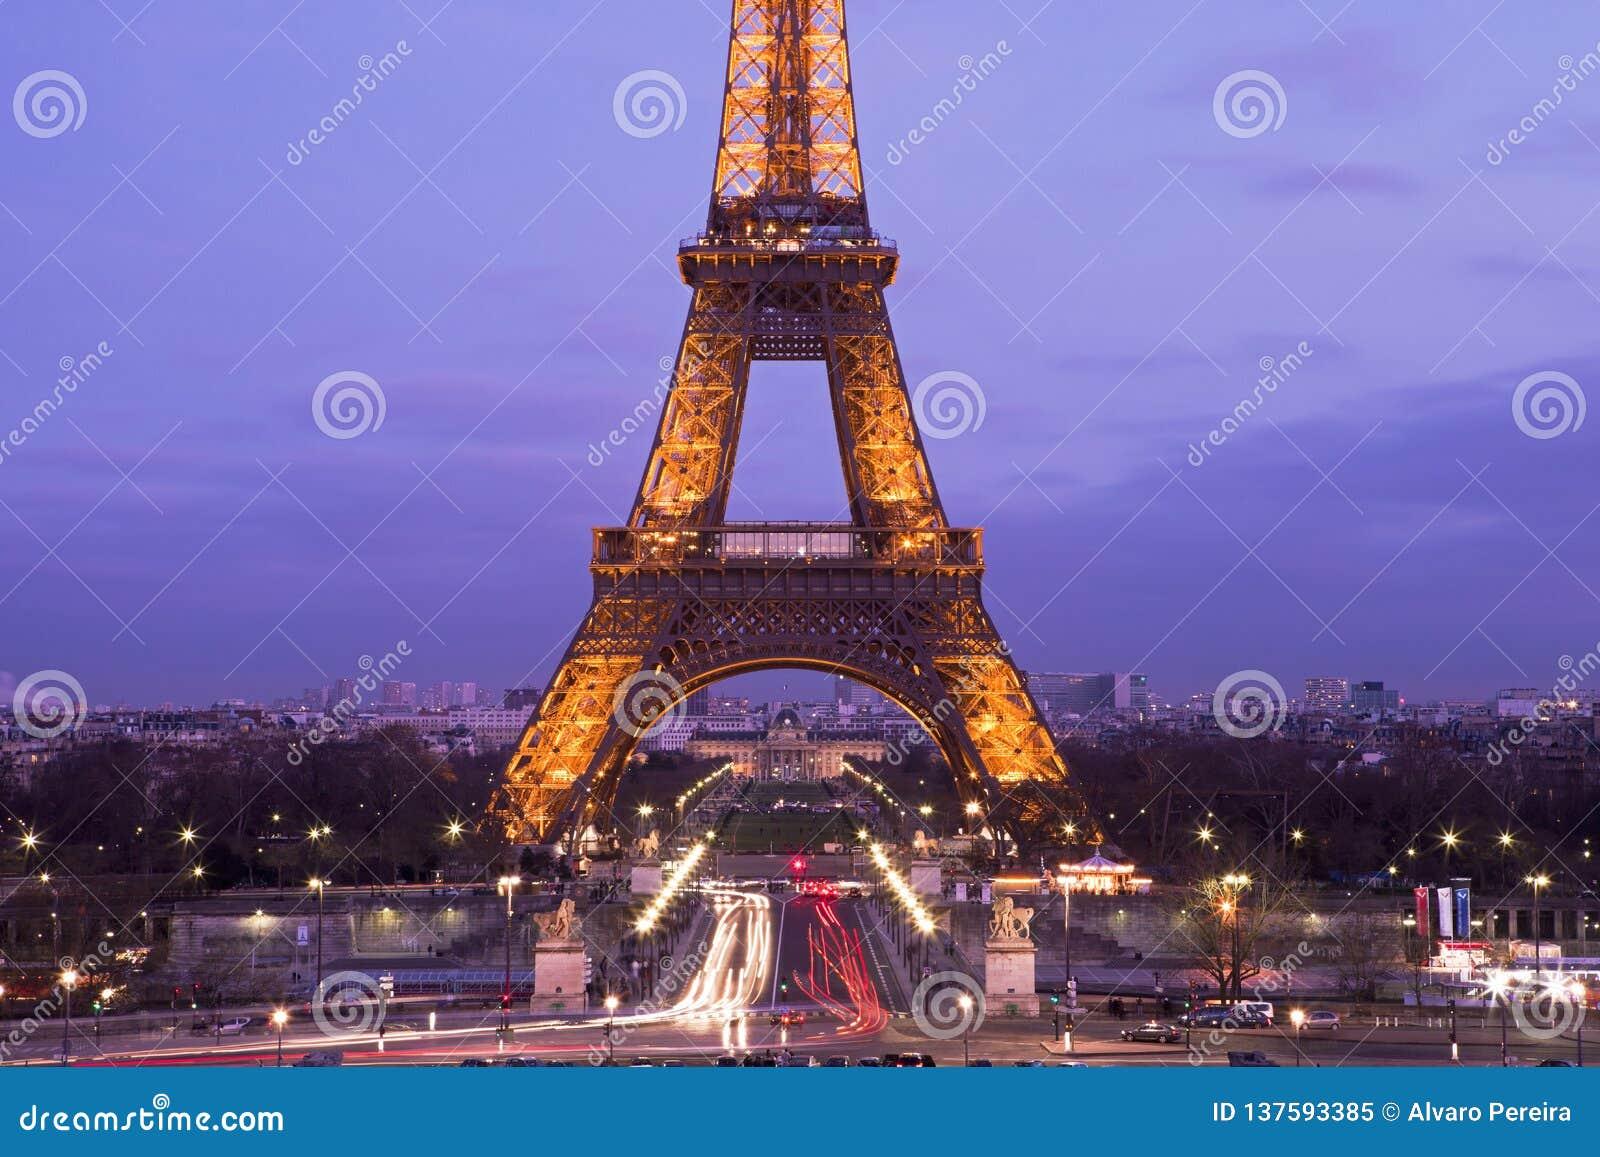 Eiffel Tower In A Purple Sunset Editorial Image Image Of Skyline Purple 137593385